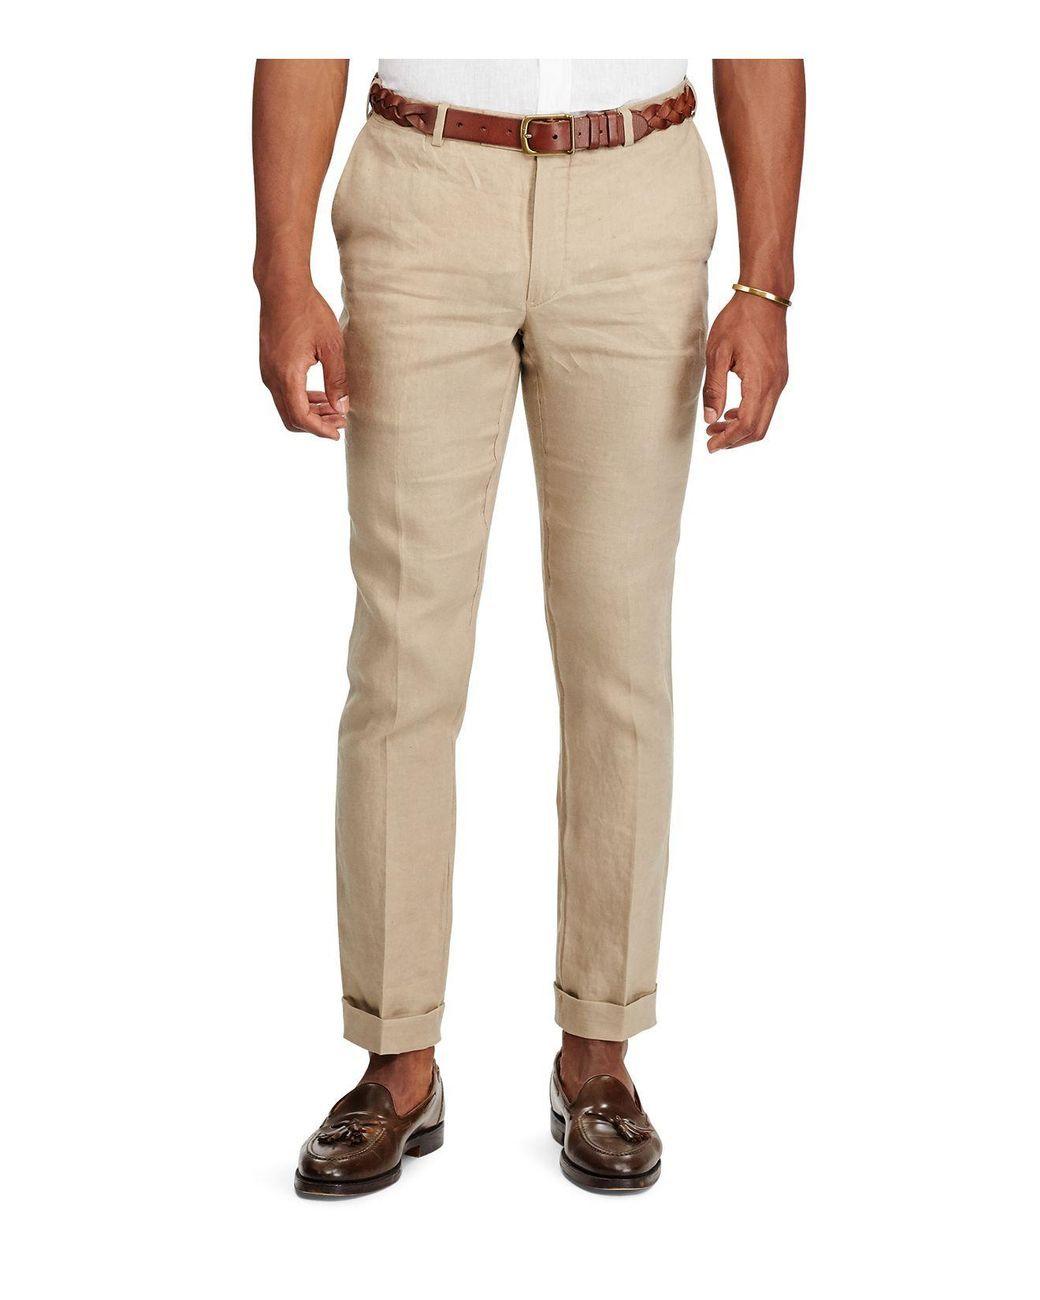 e740904d20 Men's Natural Slim Fit Linen Pants | 05 Wardrobe | Linen pants ...